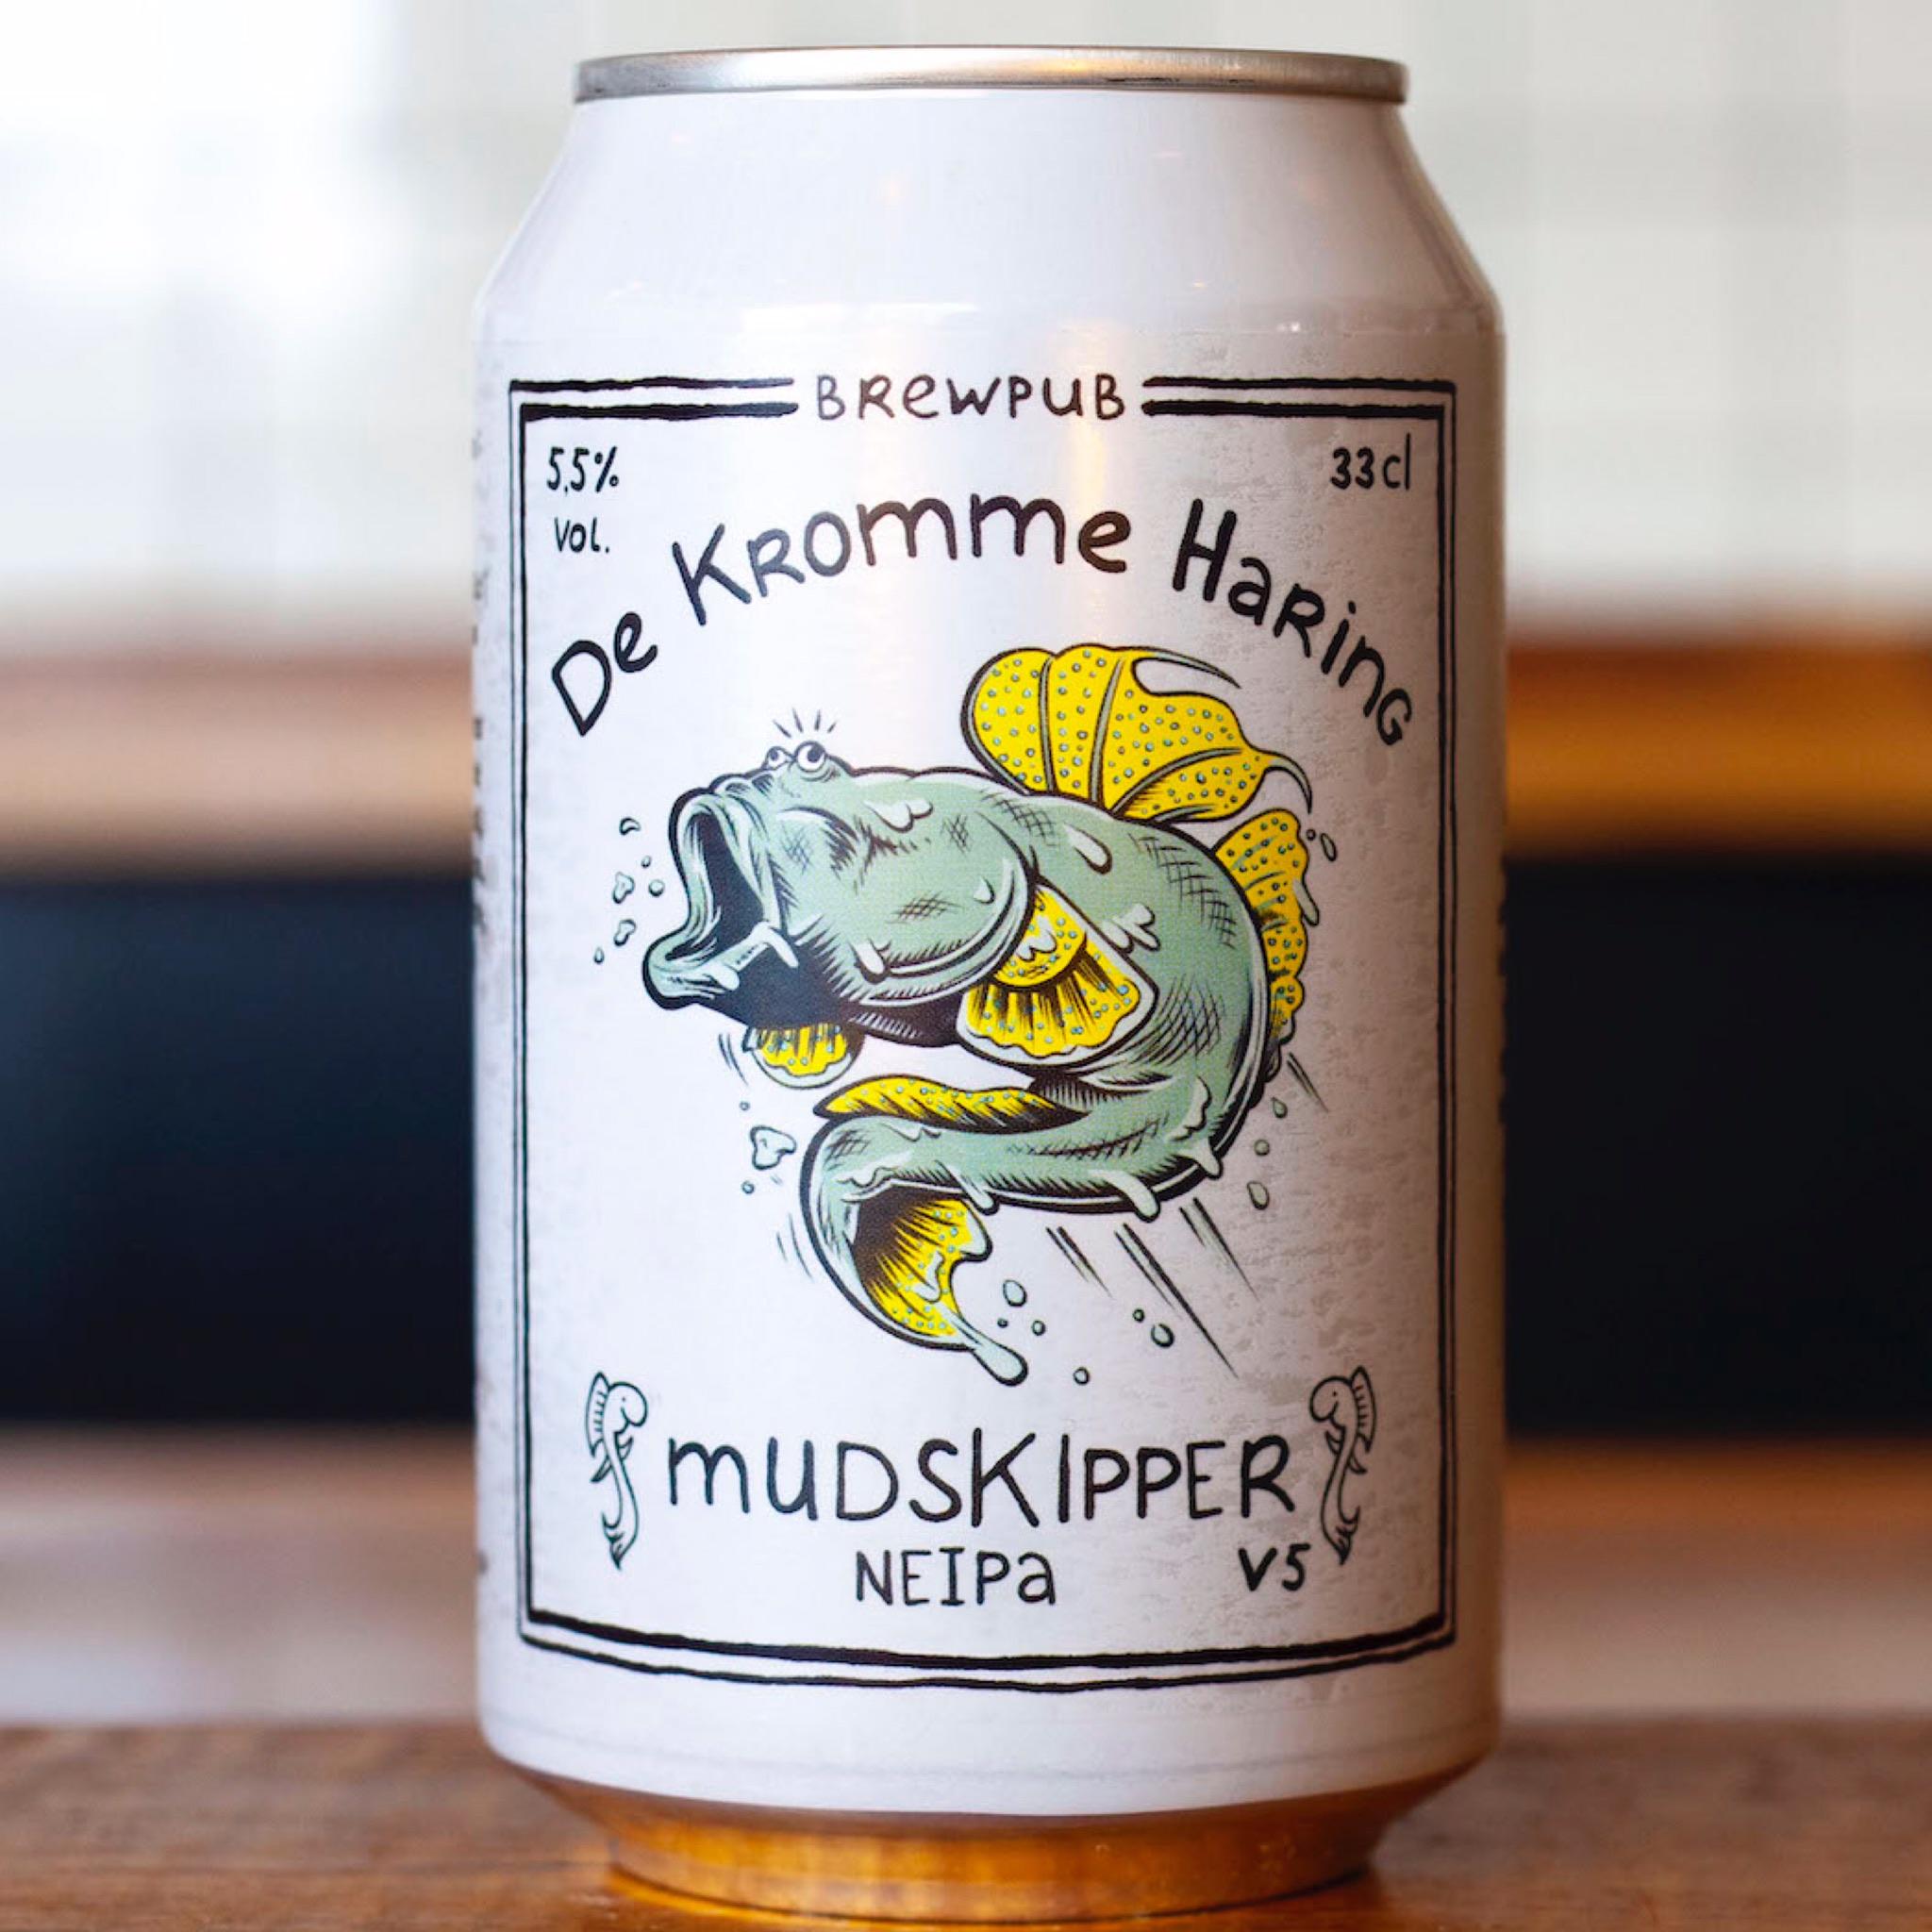 Mudskipper V5  New England IPA 5.5% 330ml De Kromme Haring